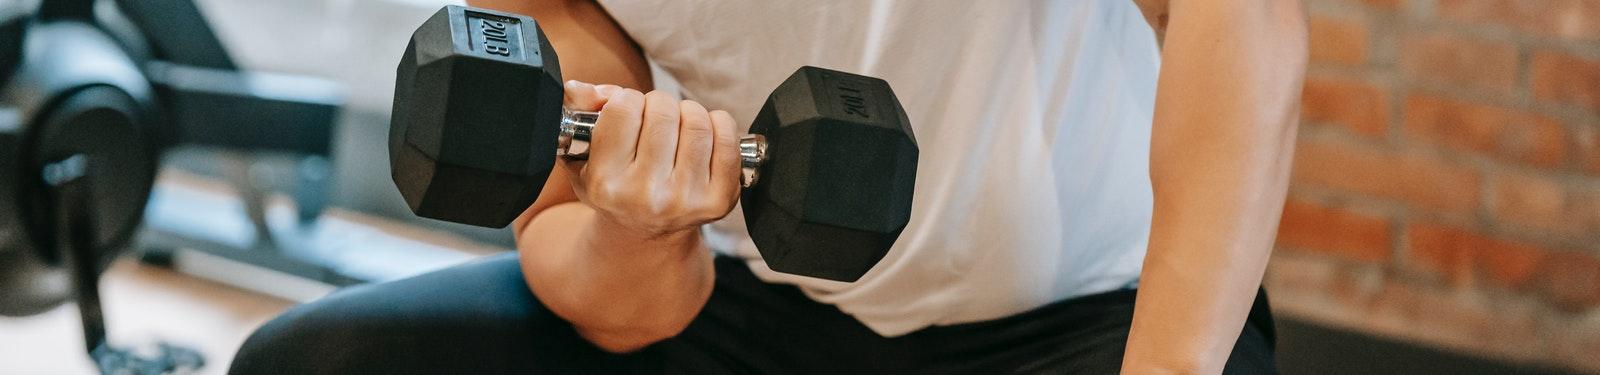 ejercicios para evitar acumular peso